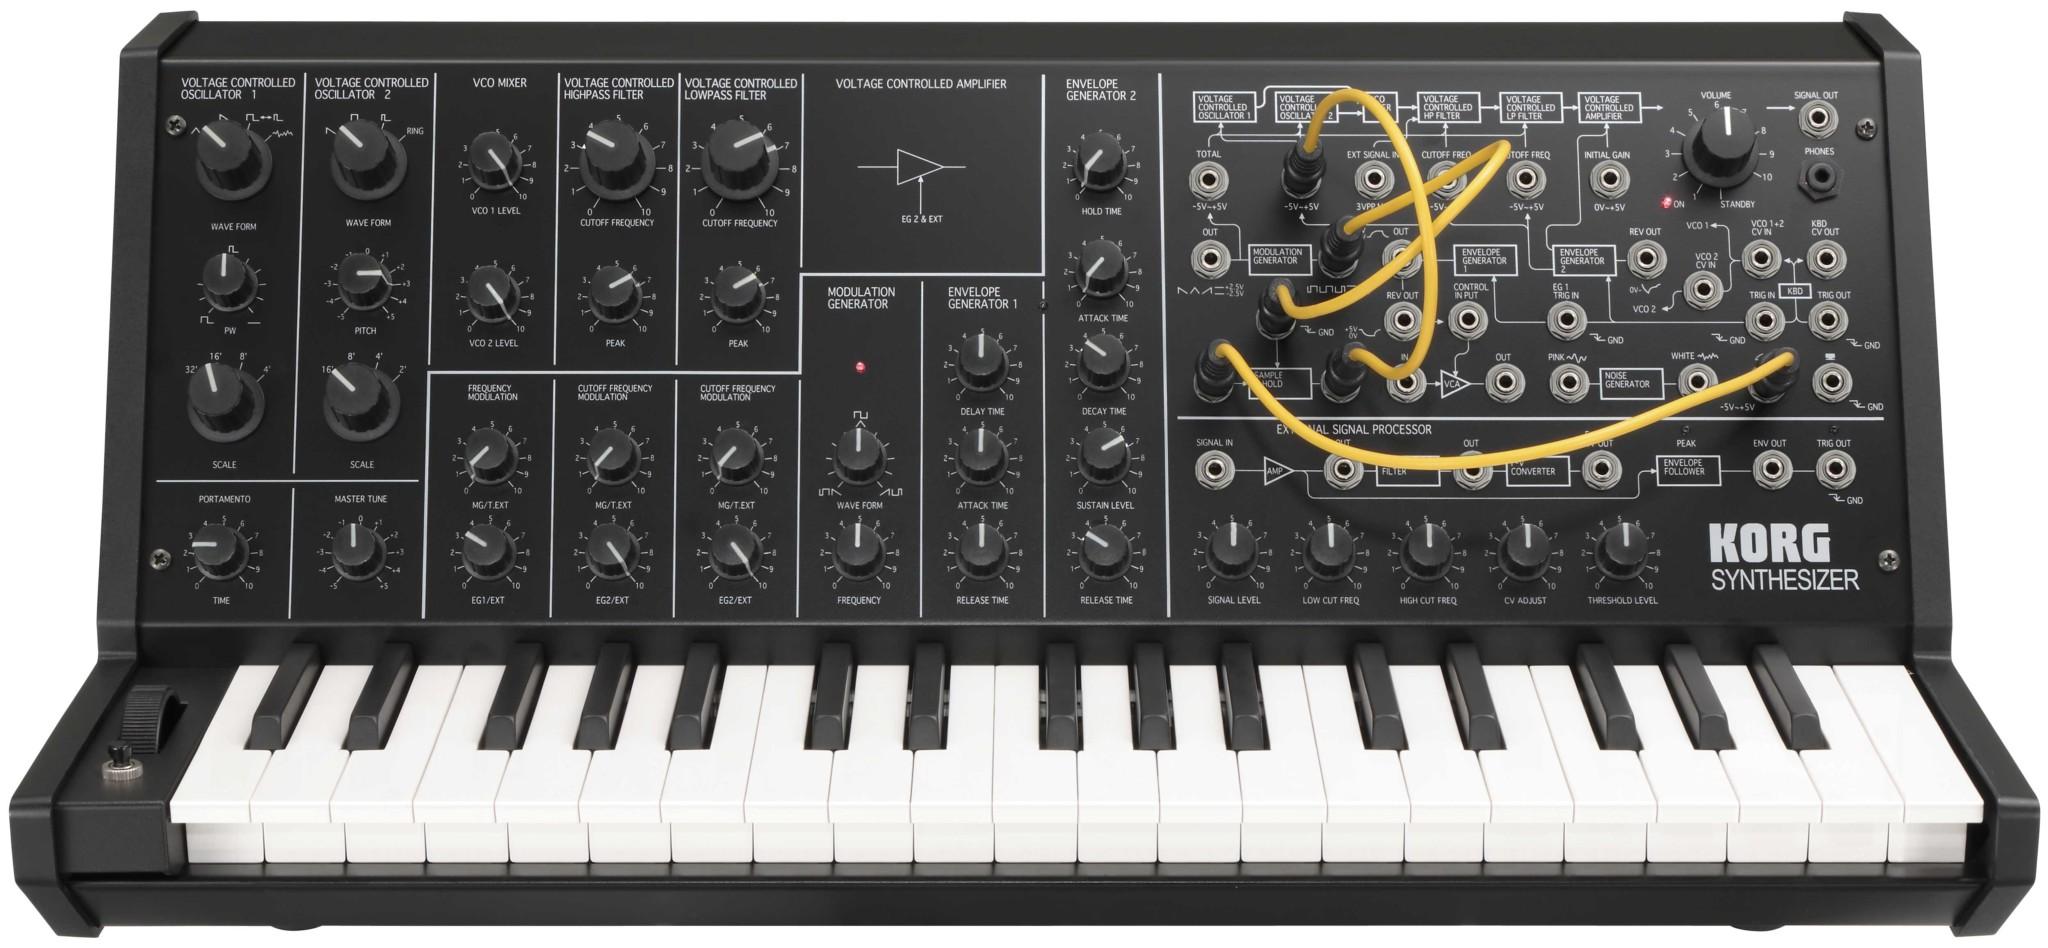 MS20 Mini MS-20 Mini synthesizer